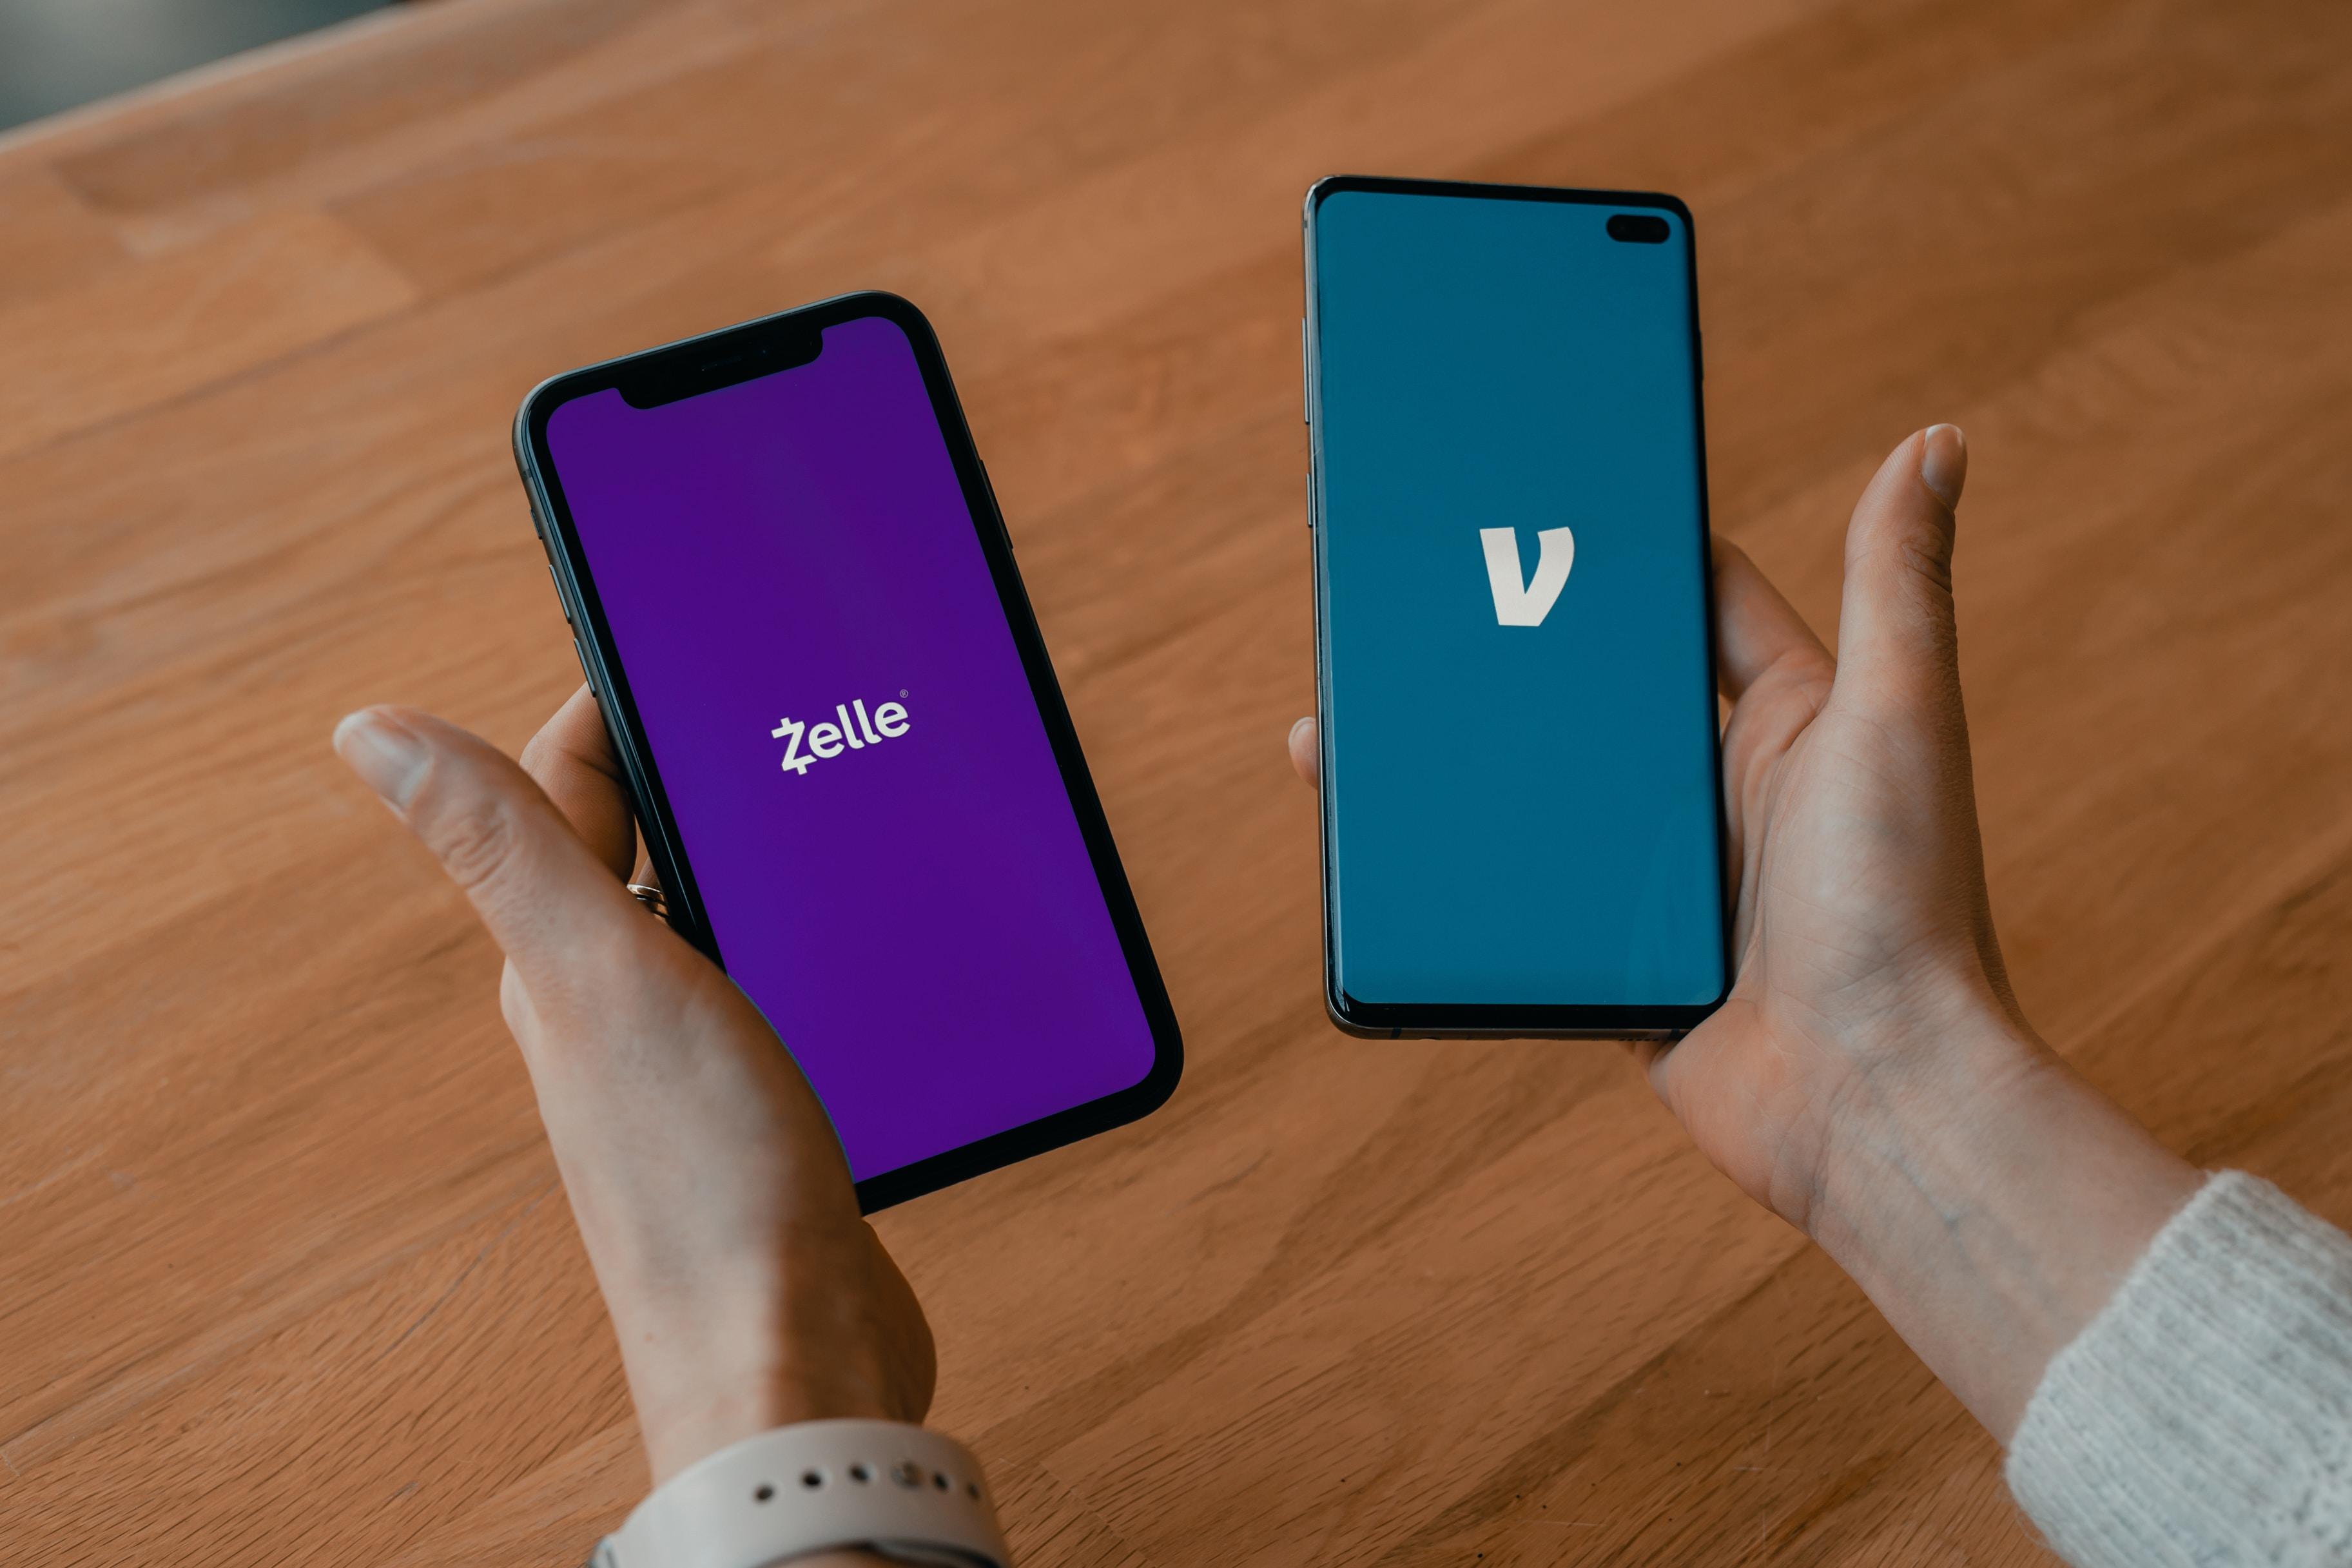 Hmm Venmo or Zelle? What's best for money transfer? Via: techdaily.ca - #zelle #cashapp #venmo #wealthsimplecash ferwise #money